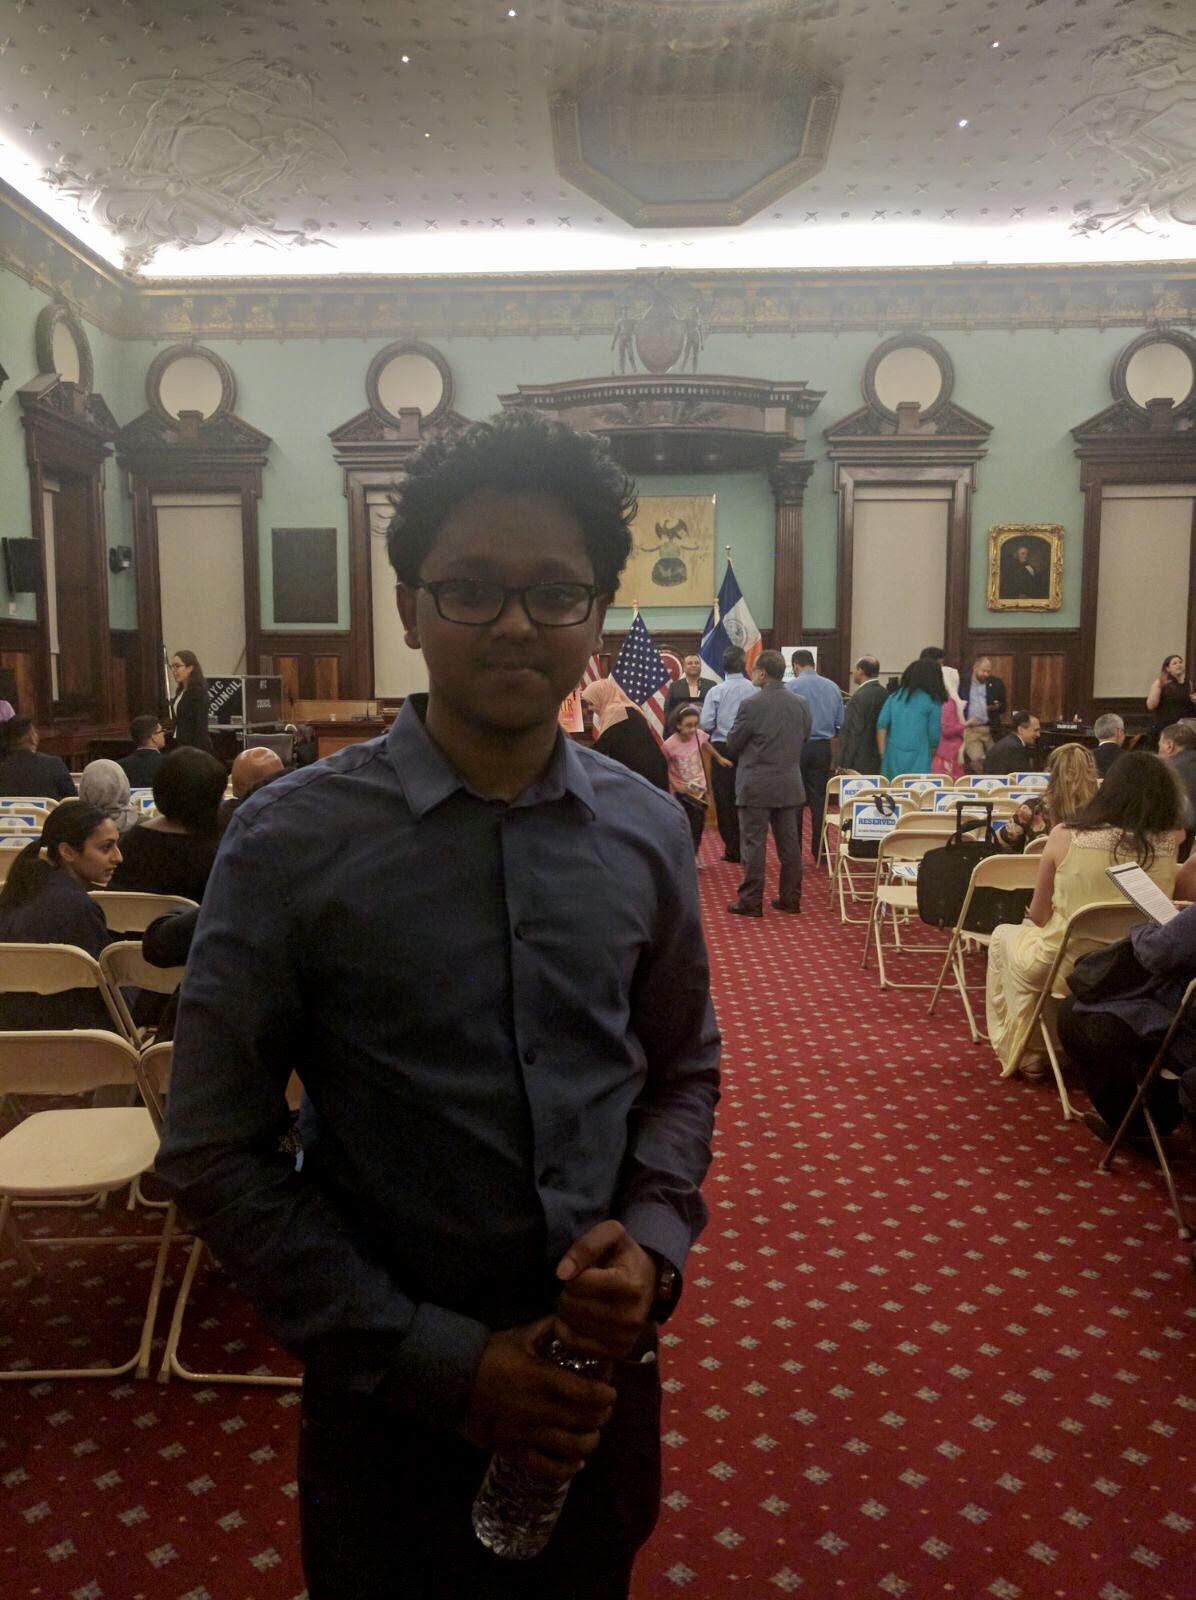 Irshaad at the Eid-Al-Fitr Celebration in City Hall